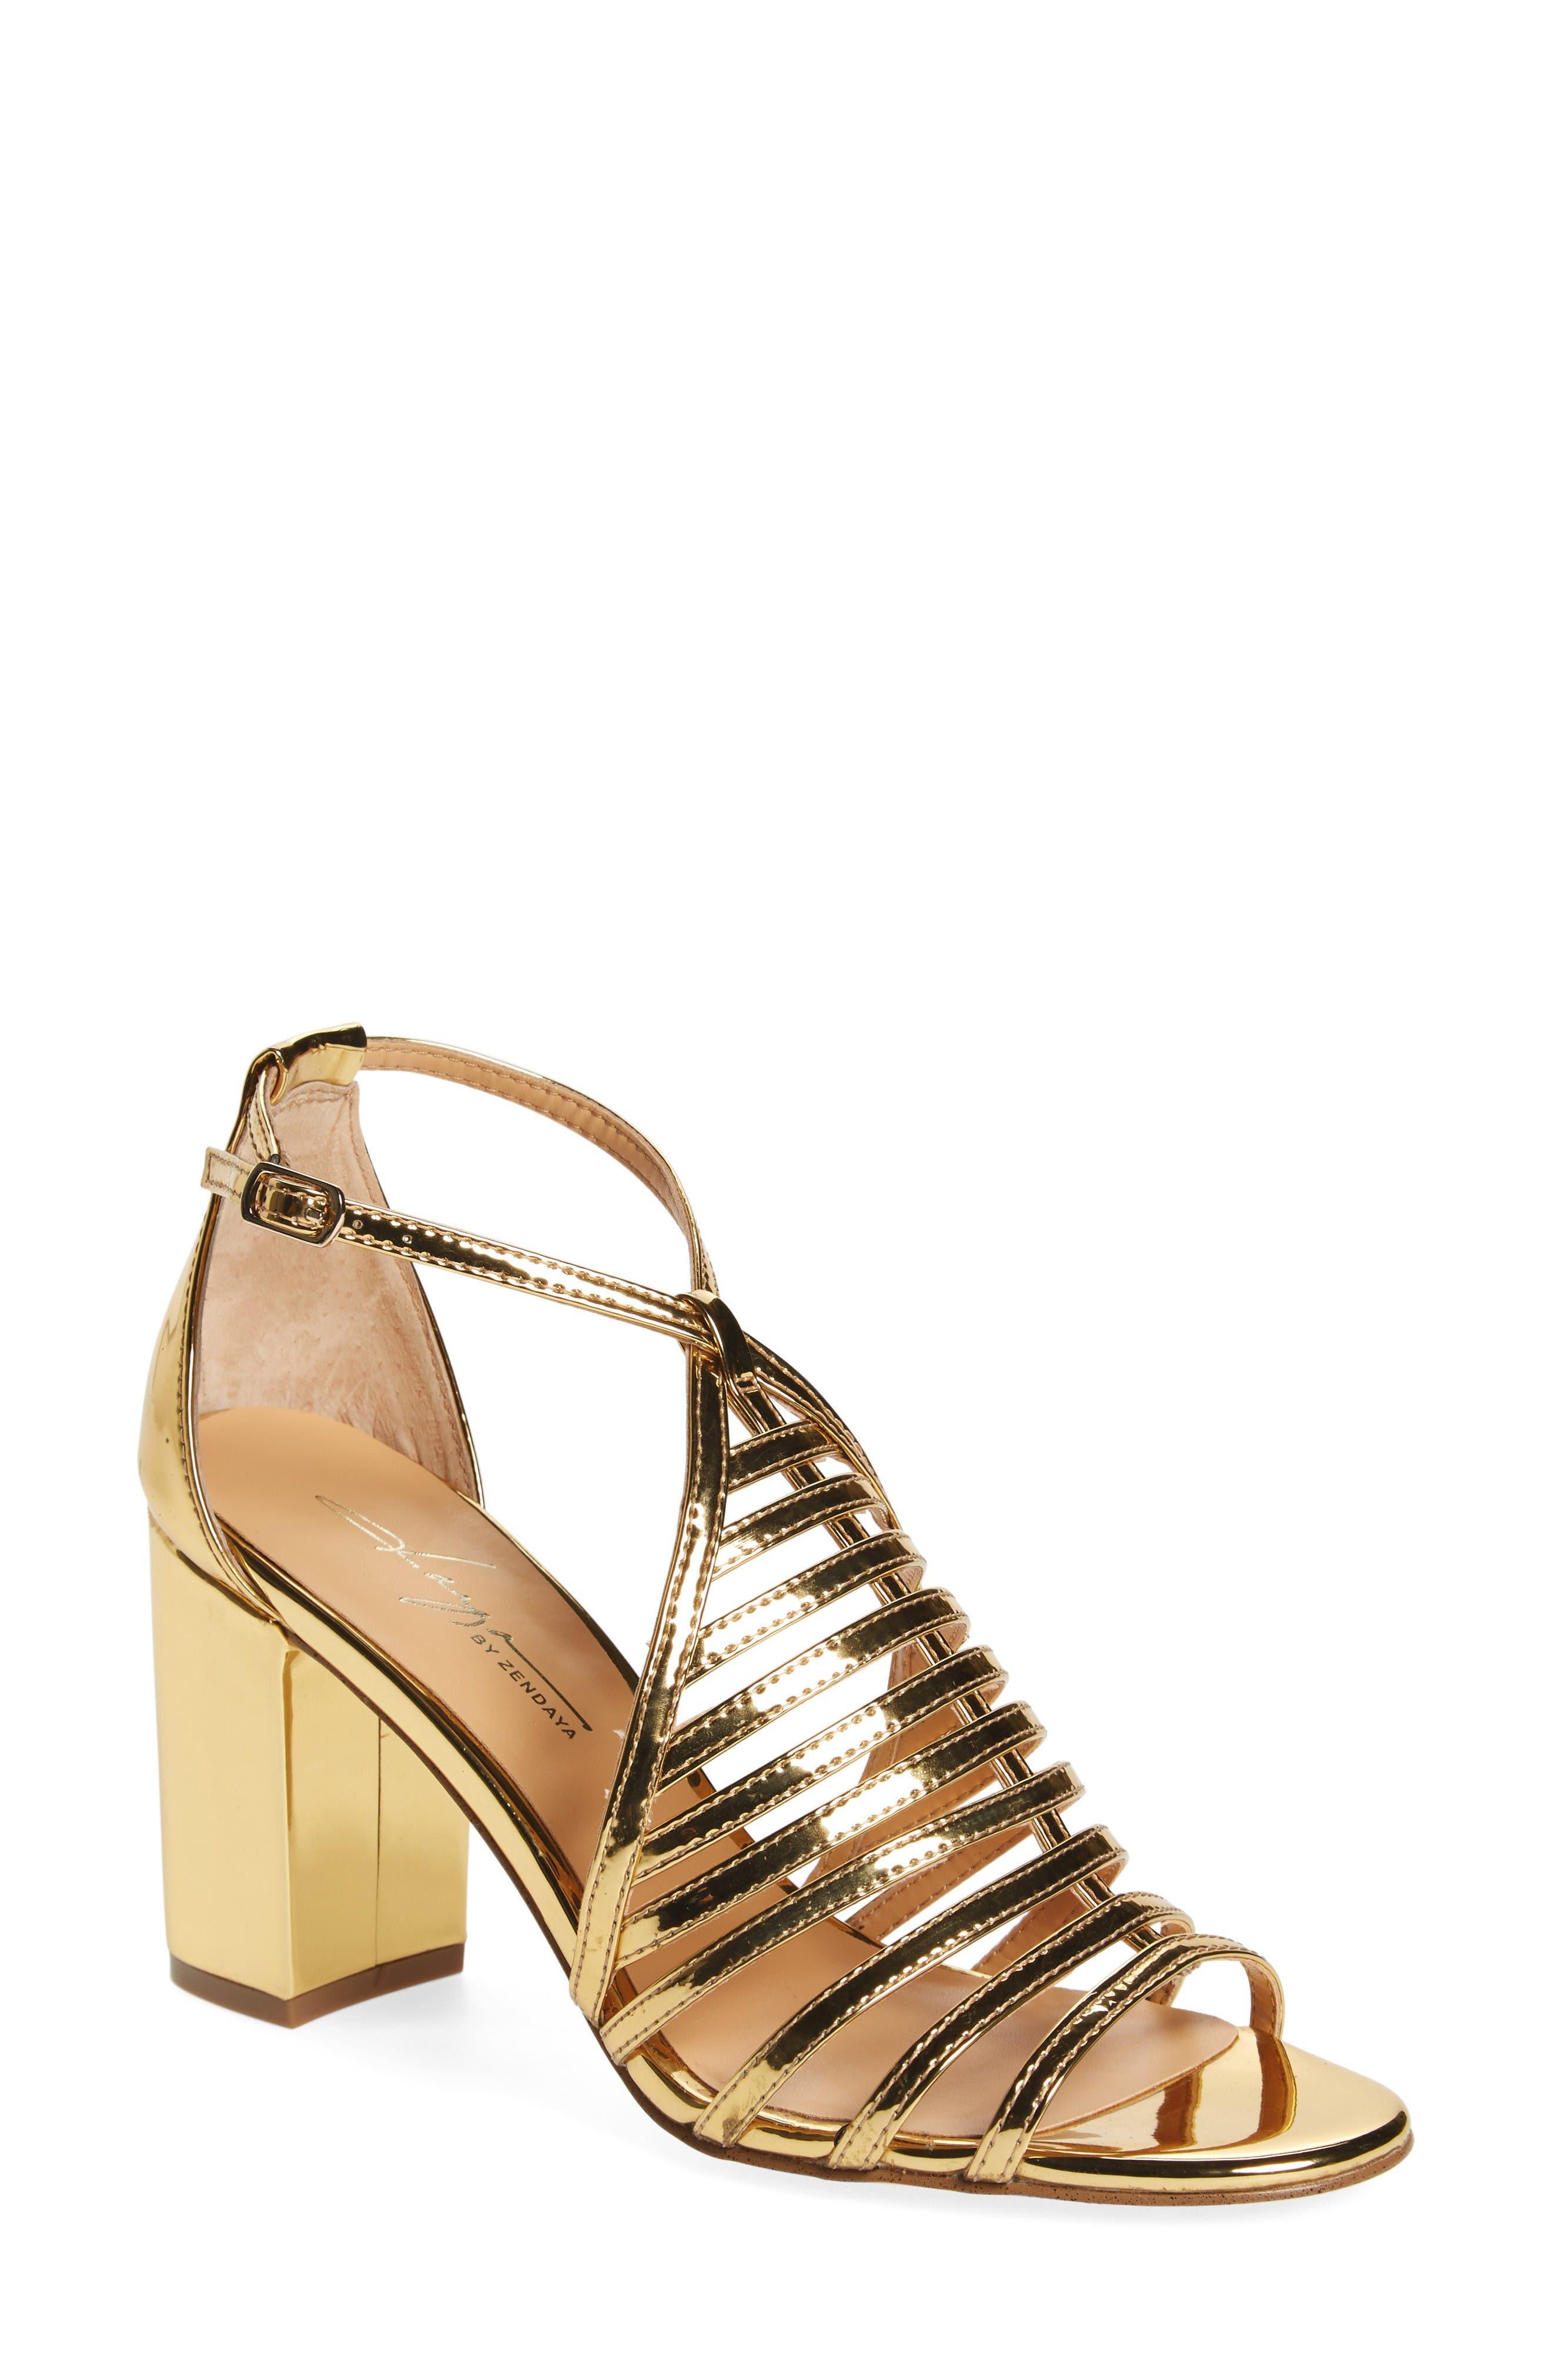 Main Image - Daya by Zendaya Soda Block Heel Sandal (Women)